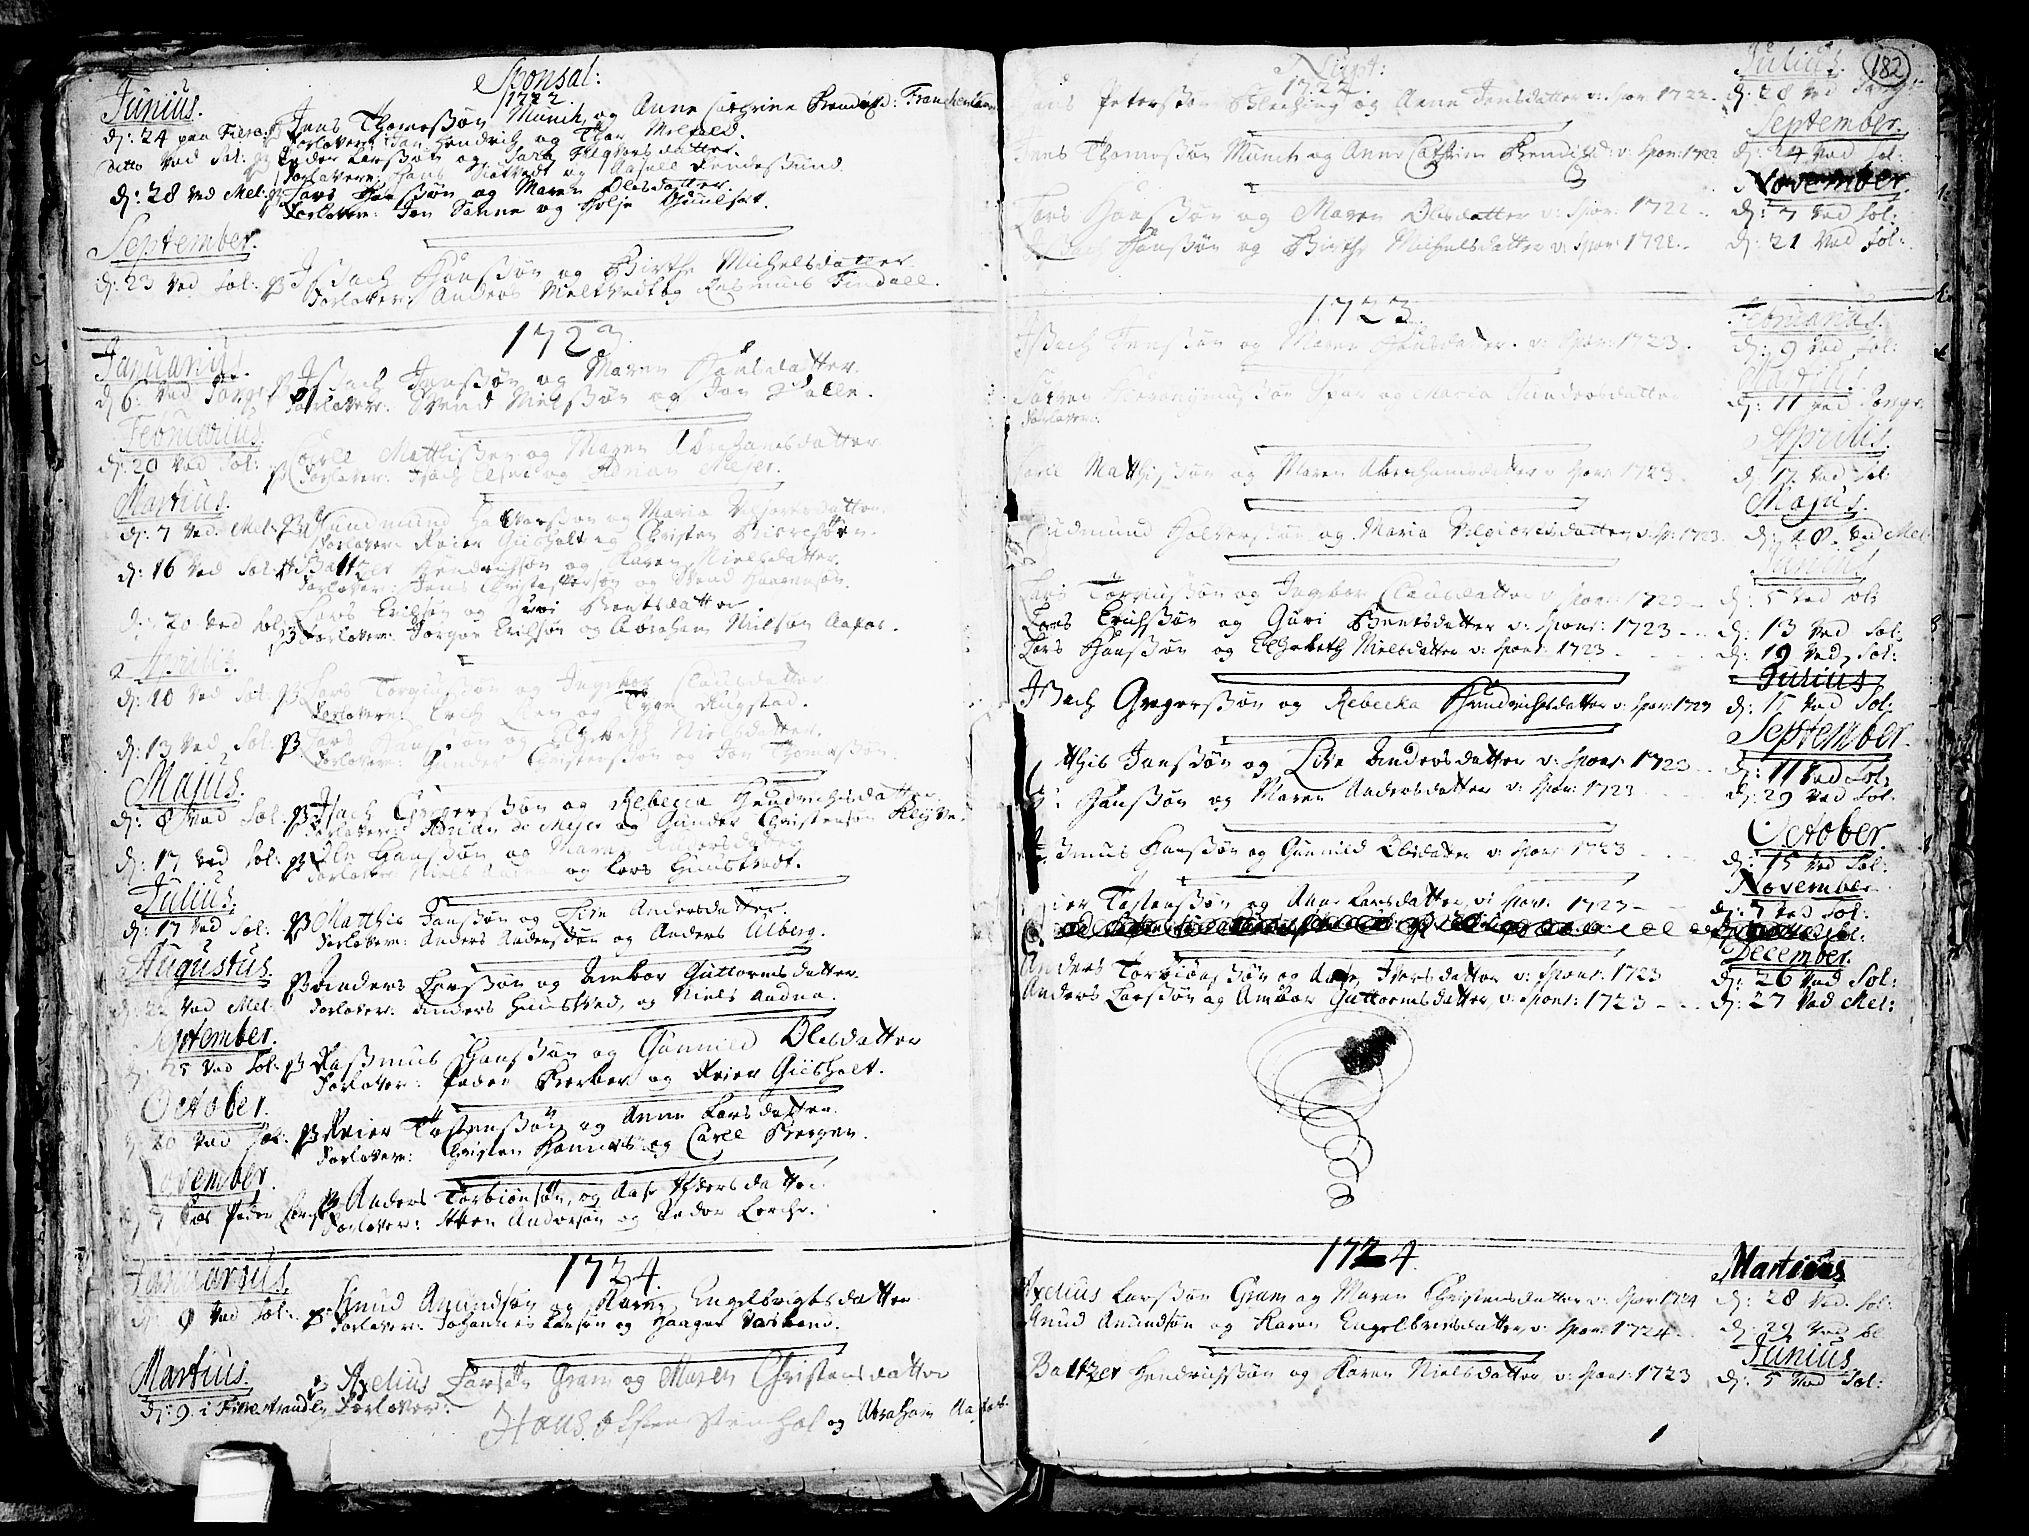 SAKO, Solum kirkebøker, F/Fa/L0002: Ministerialbok nr. I 2, 1713-1761, s. 182